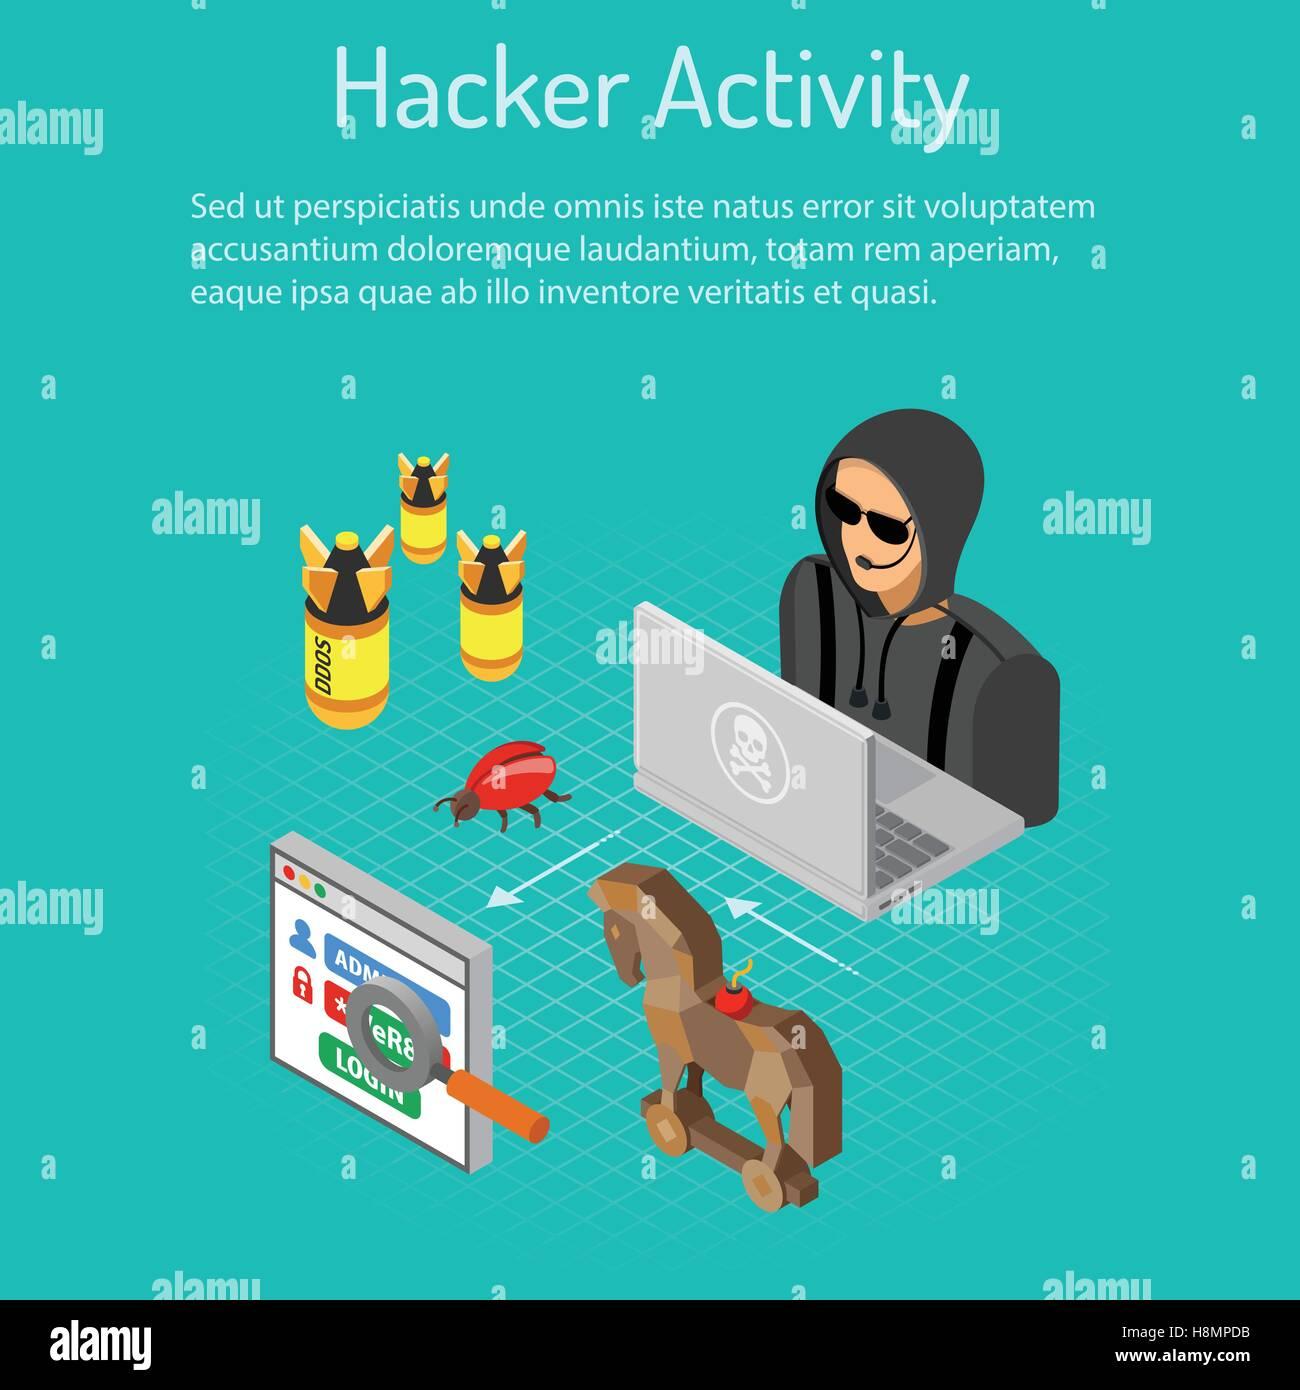 Hacker Activity Concept - Stock Image